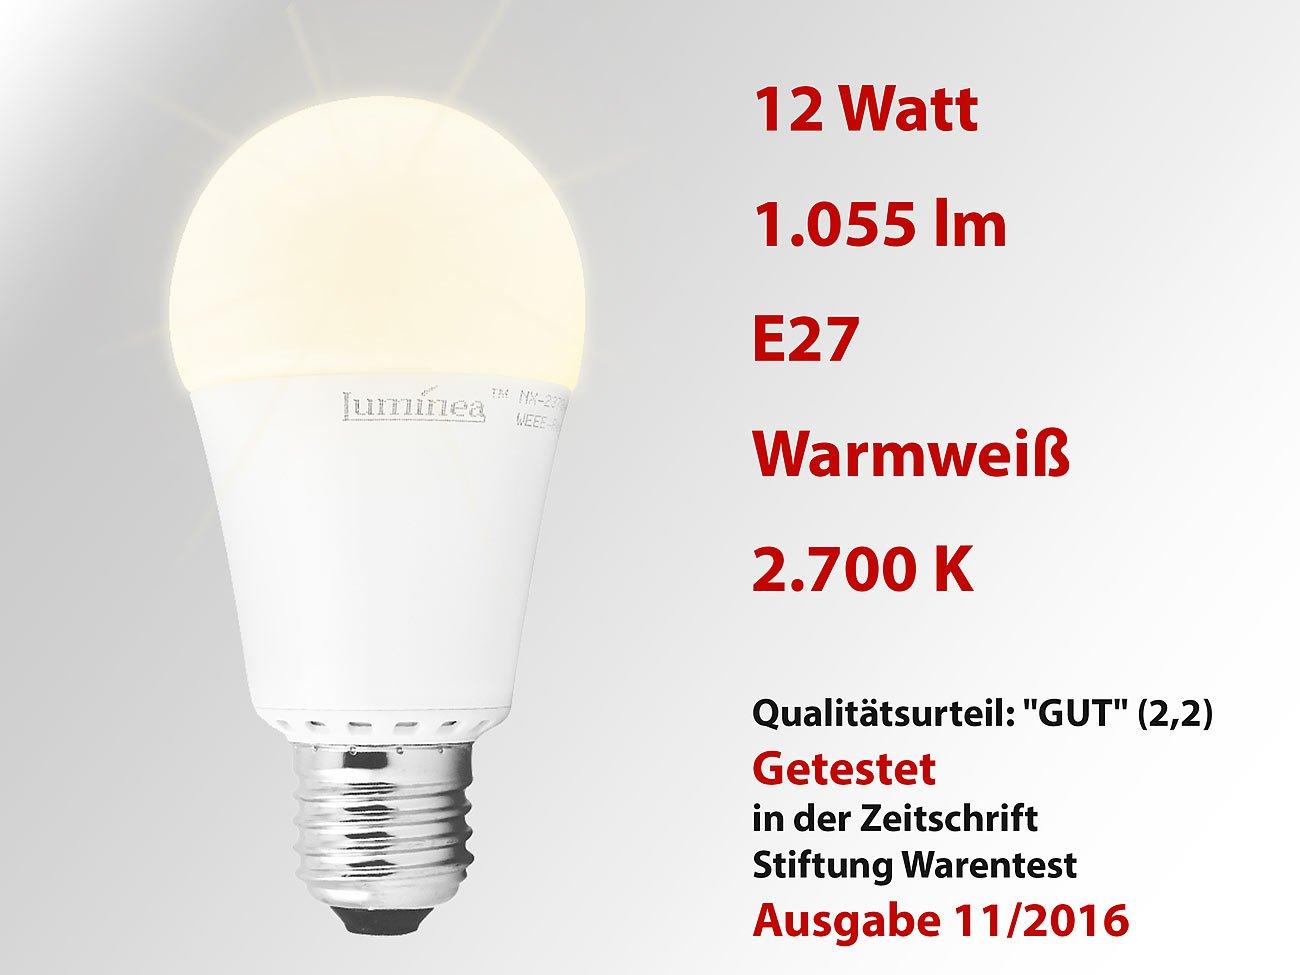 Luminea LED Tropfen: LED-Lampe, Klasse A+, 12 W, E27, warmweiß ...